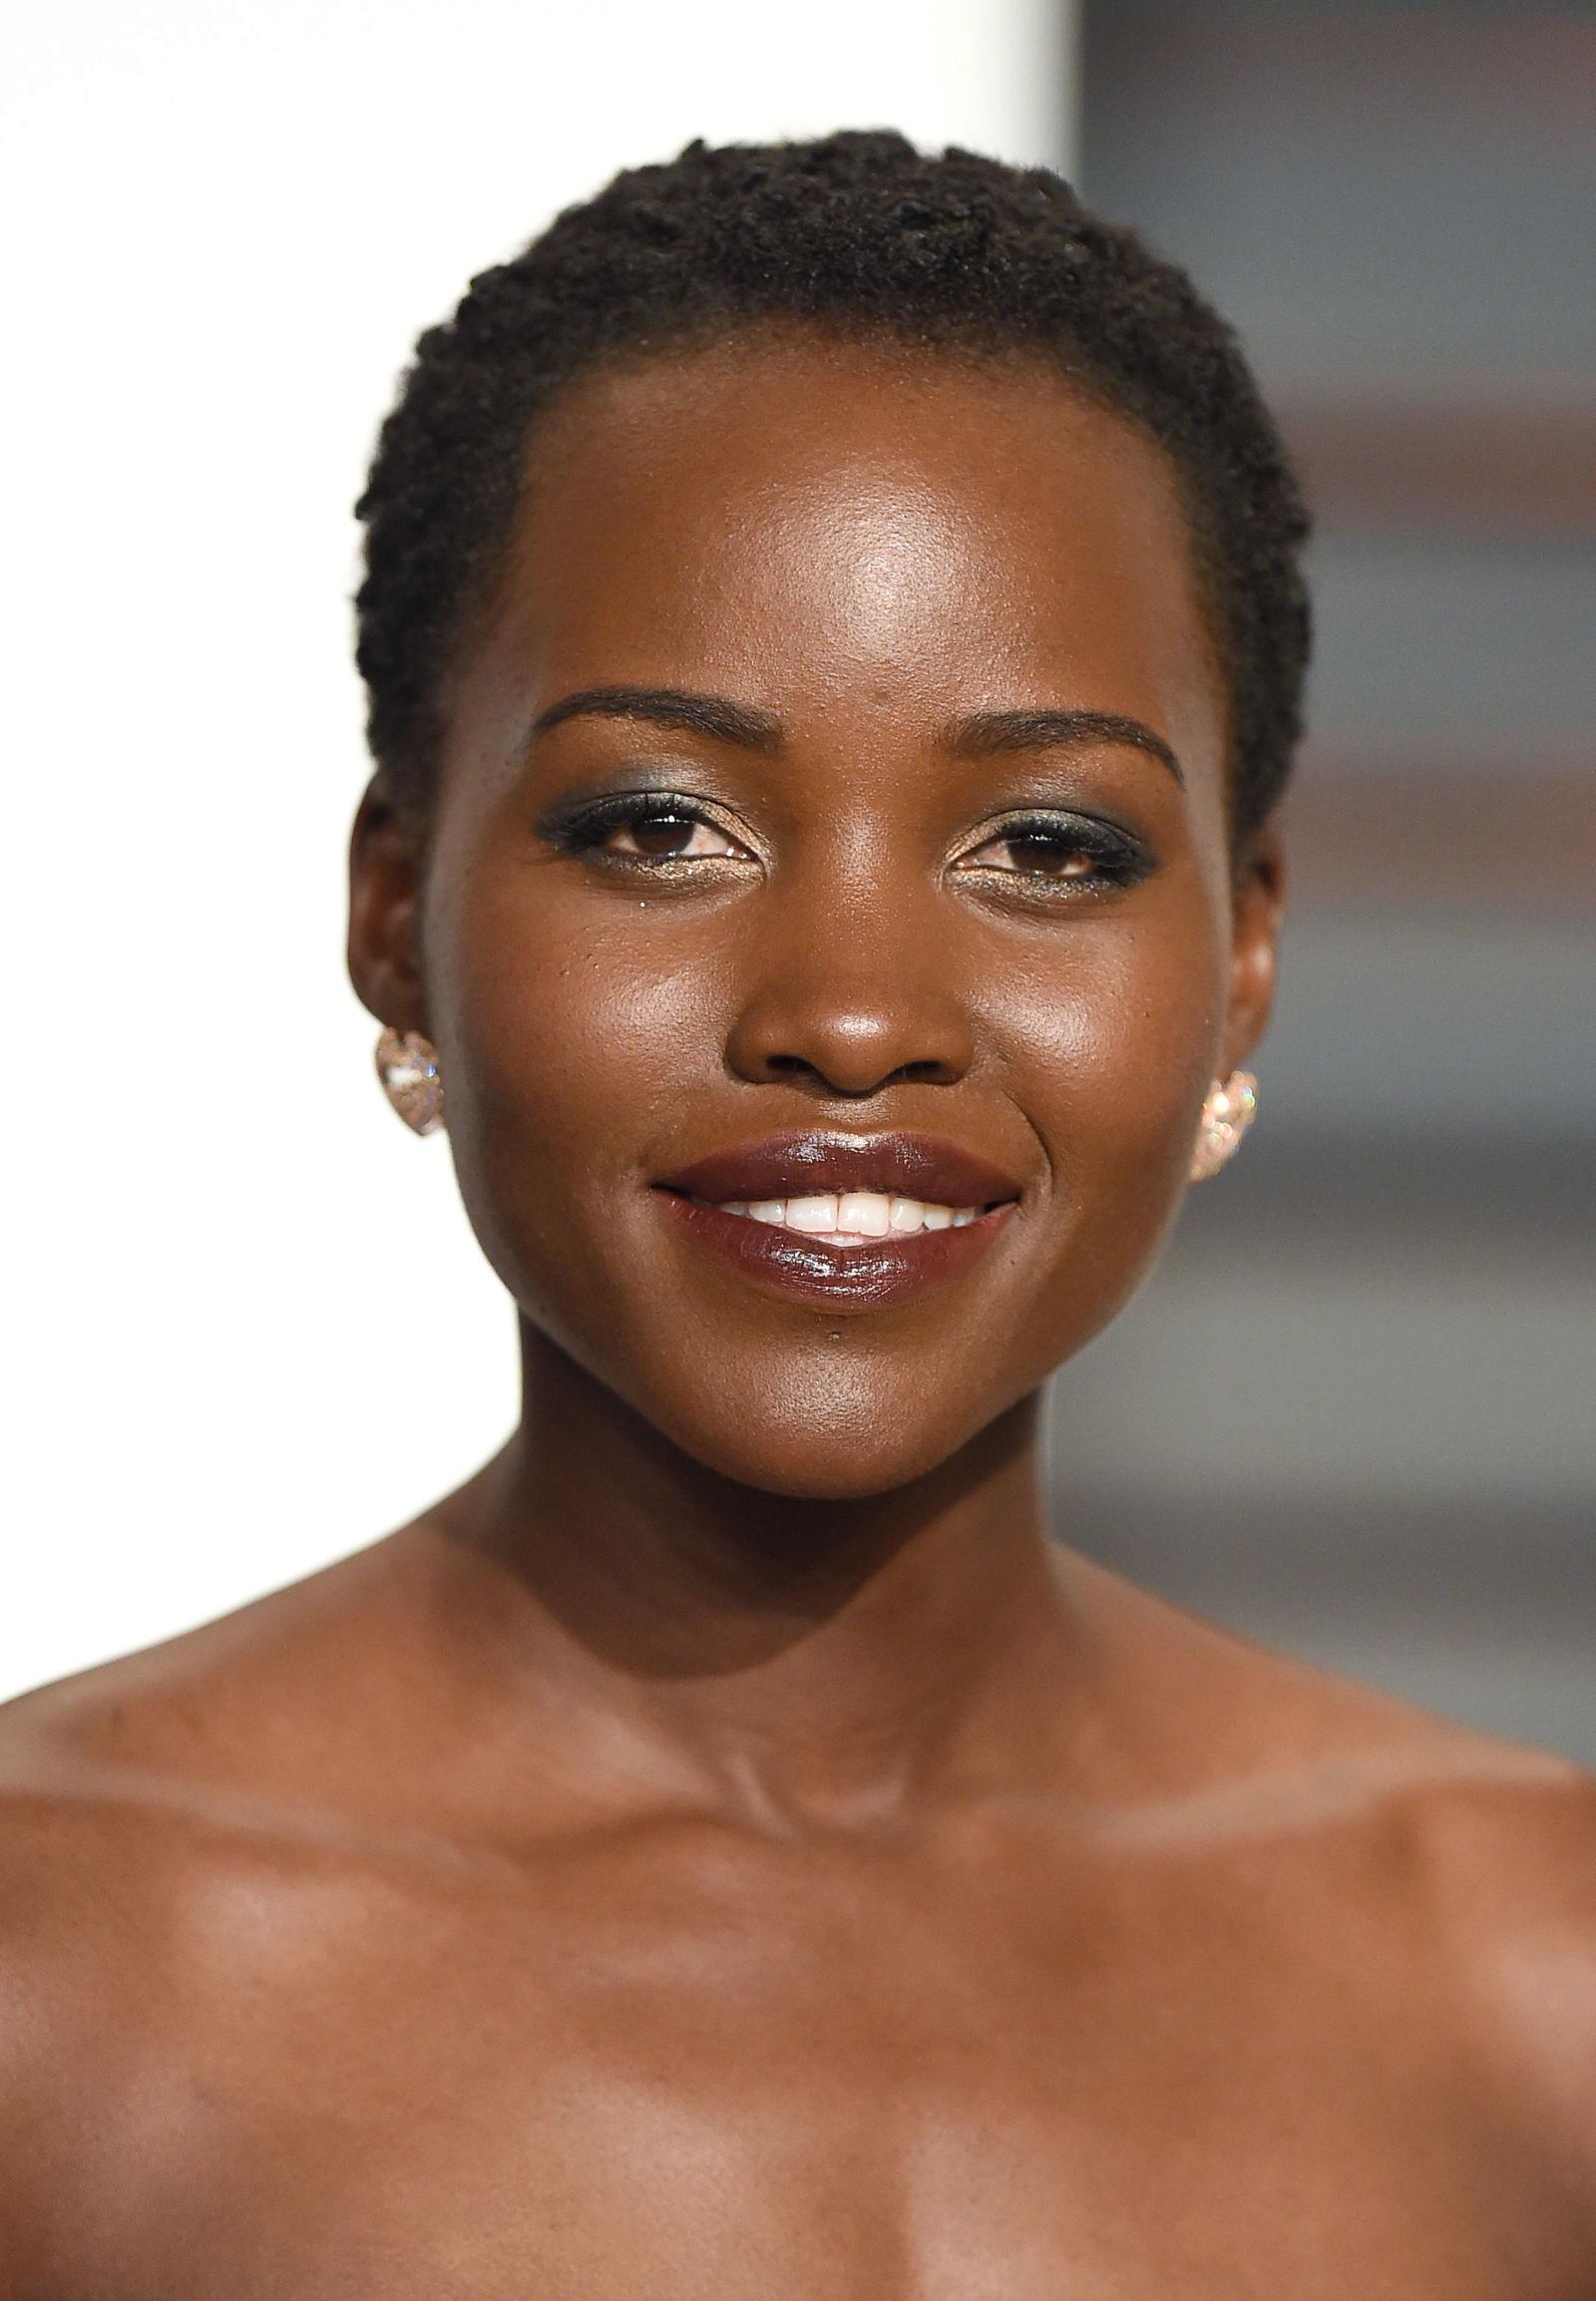 jazzy black women short hairstyles 2016 | hairstyles 2017, hair